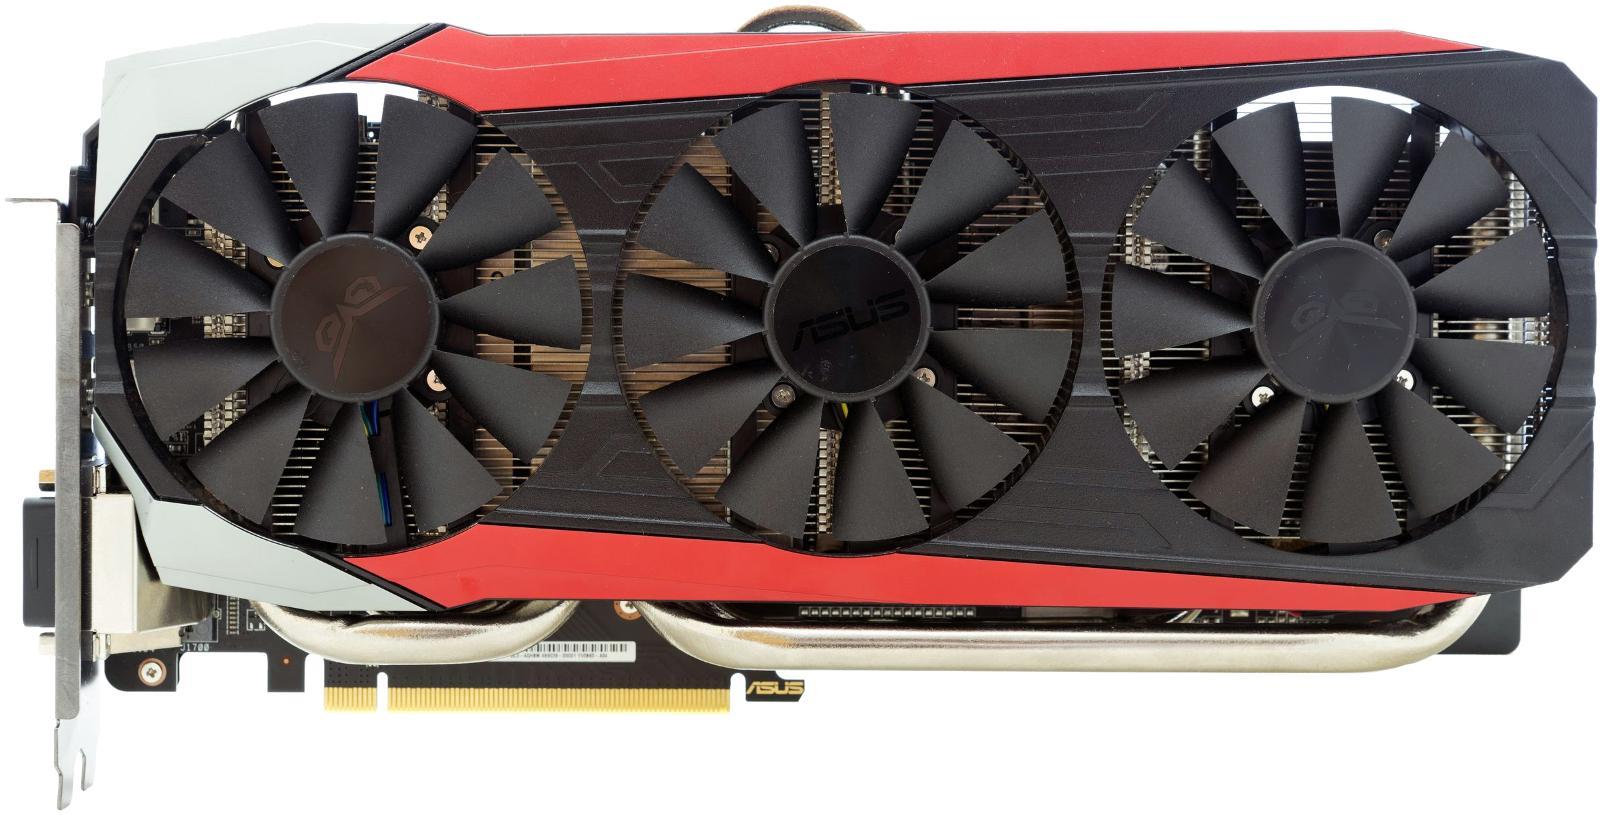 Asus Strix Radeon R9 390 DirectCU III